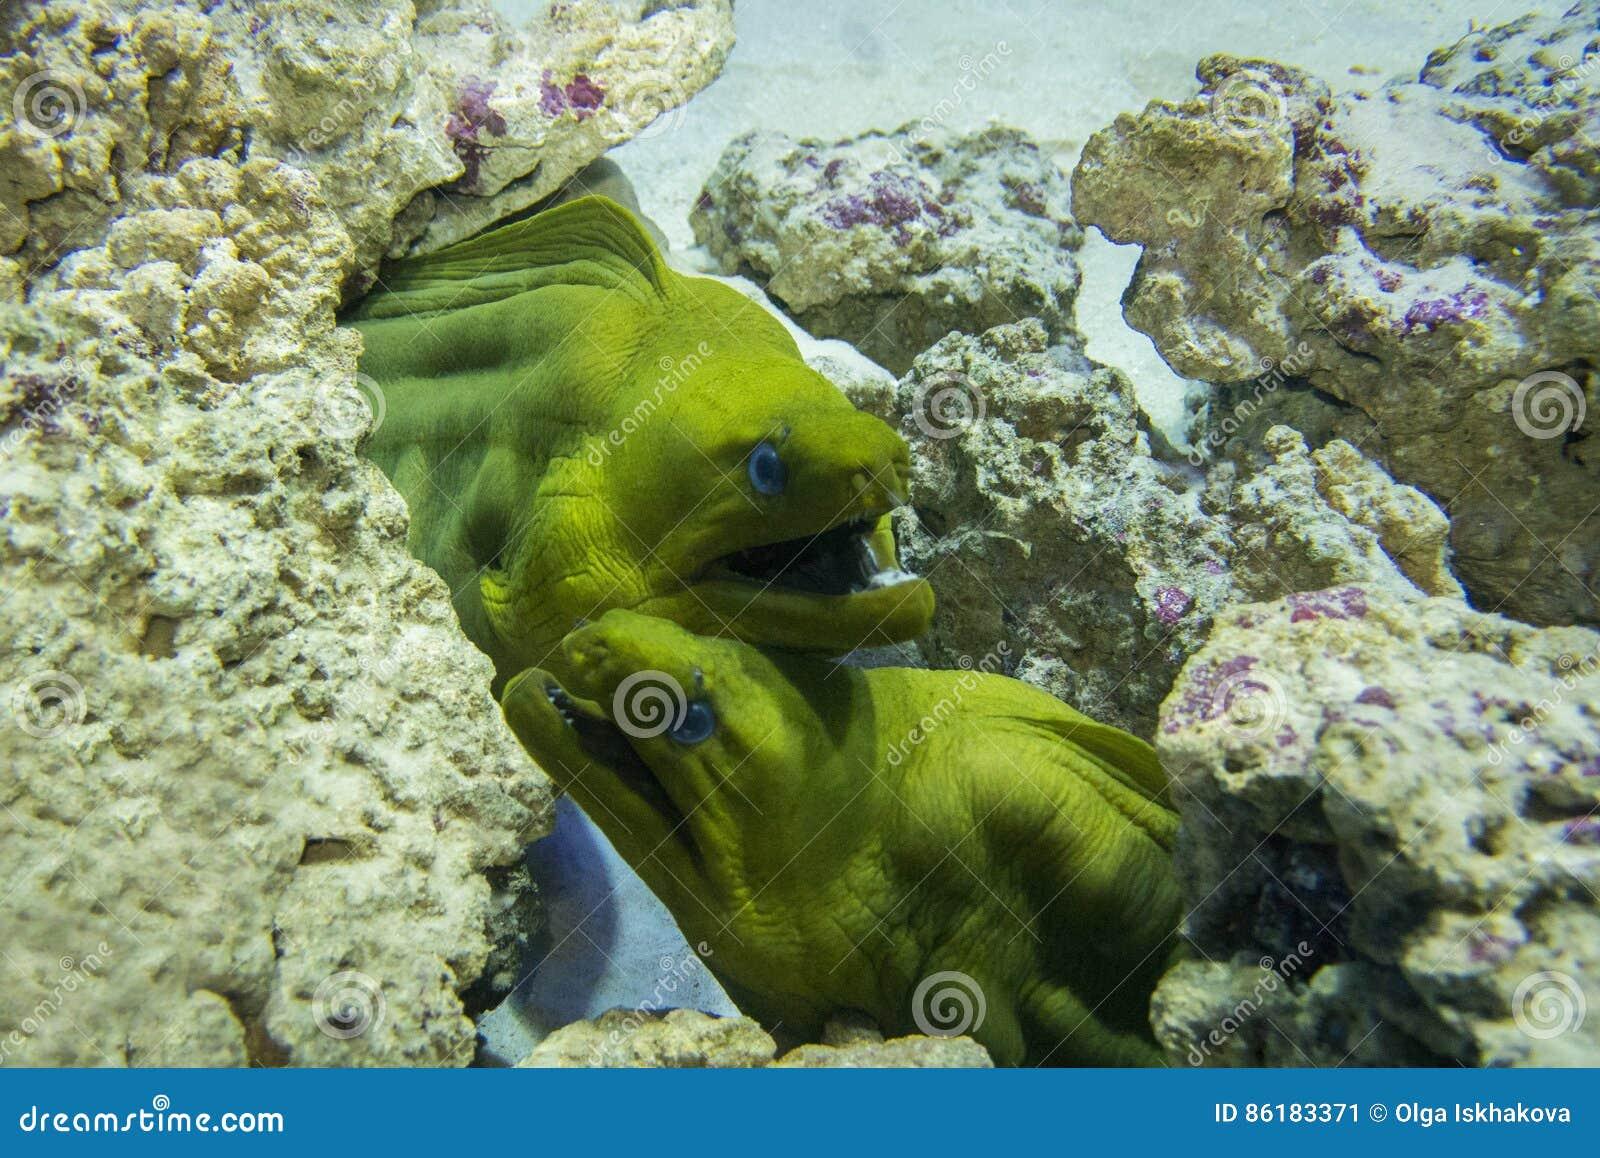 Green Moray Gymnothorax funebris